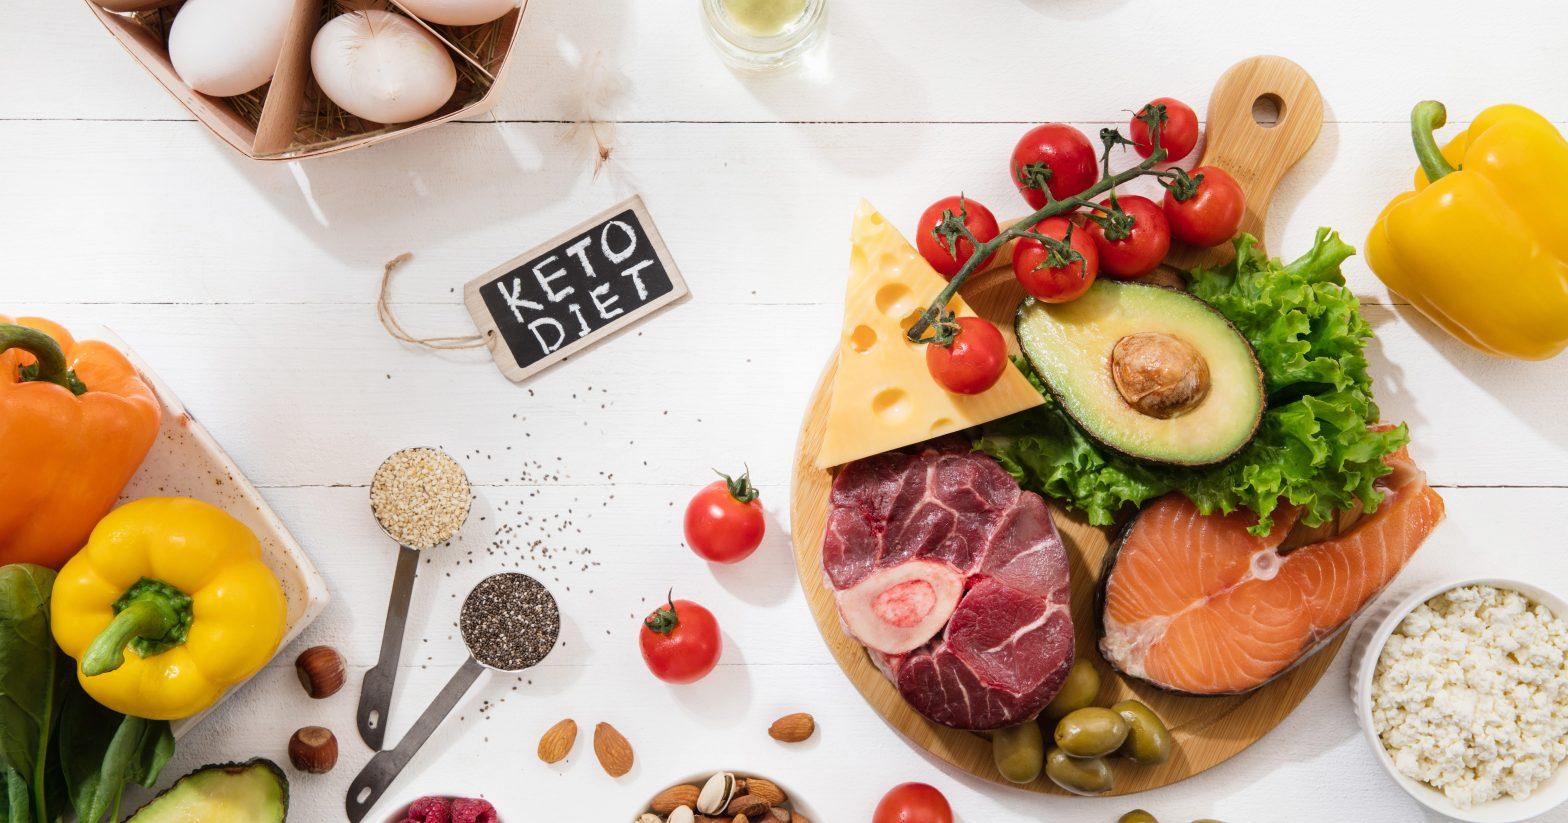 Ingredientes dieta Keto